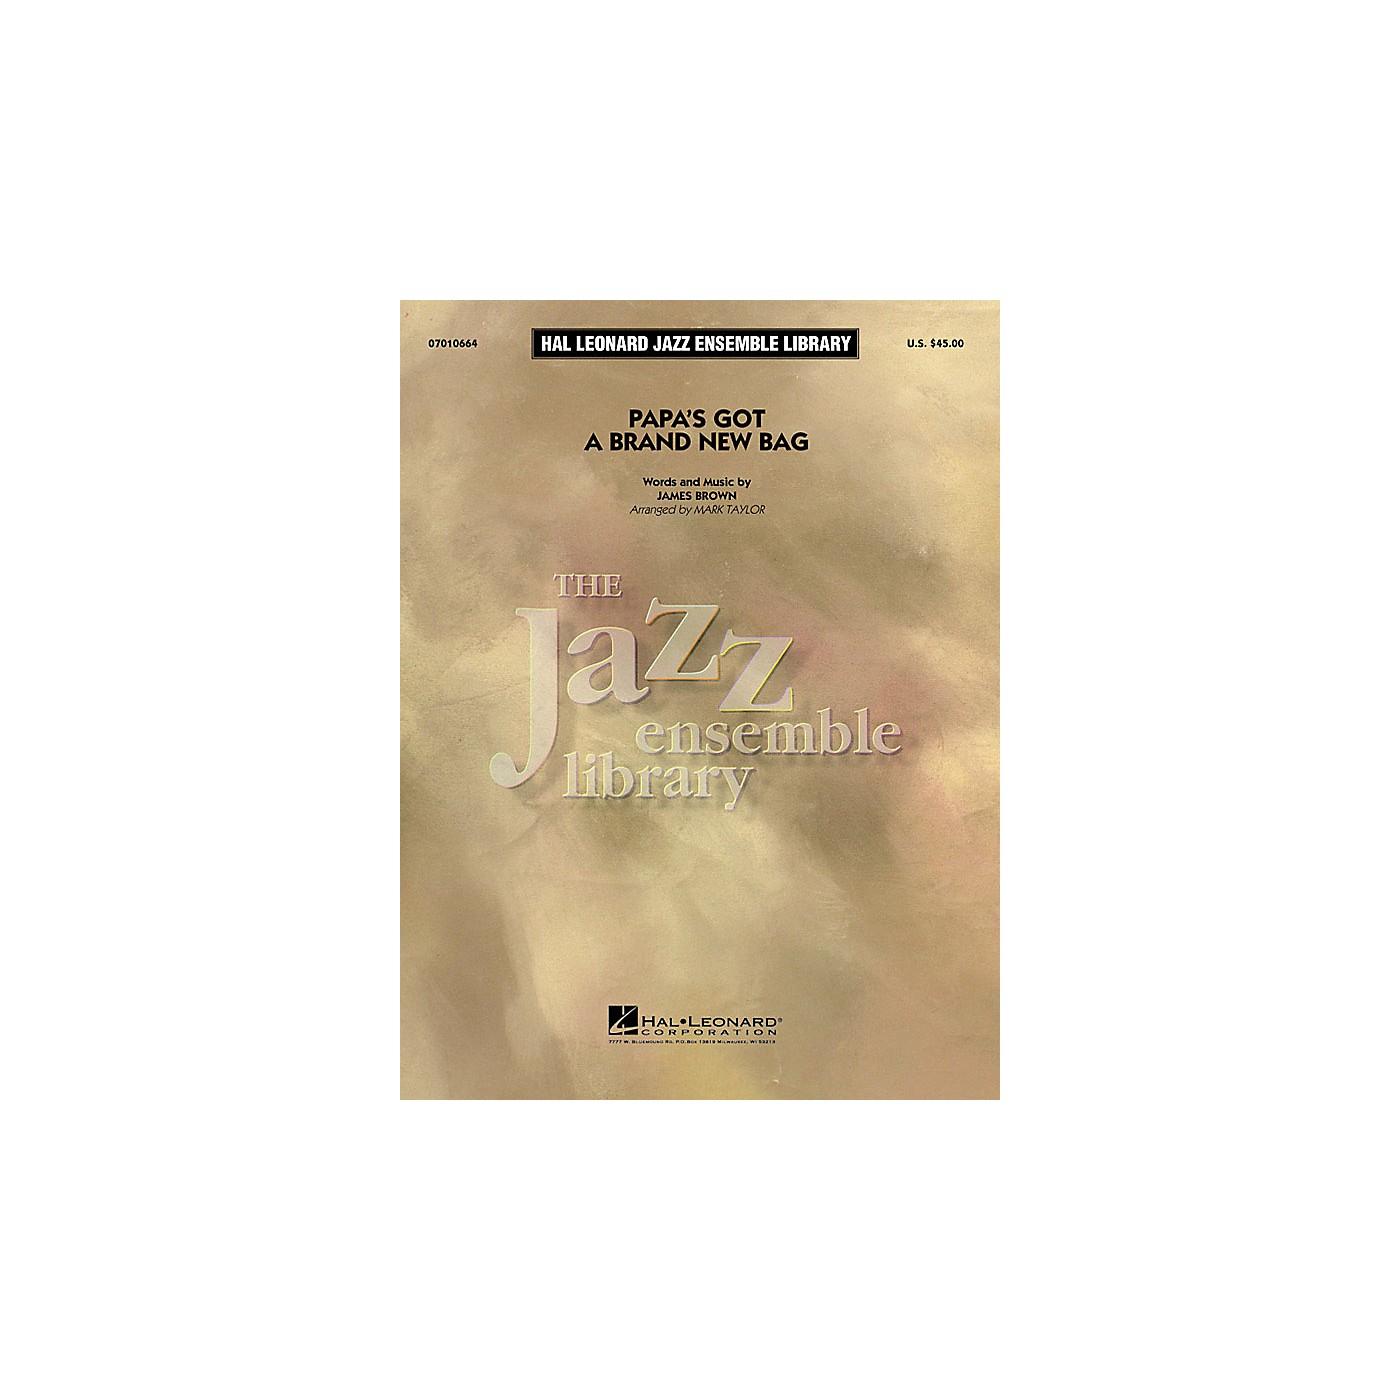 Hal Leonard Papa's Got a Brand New Bag Jazz Band Level 4 Arranged by Mark Taylor thumbnail